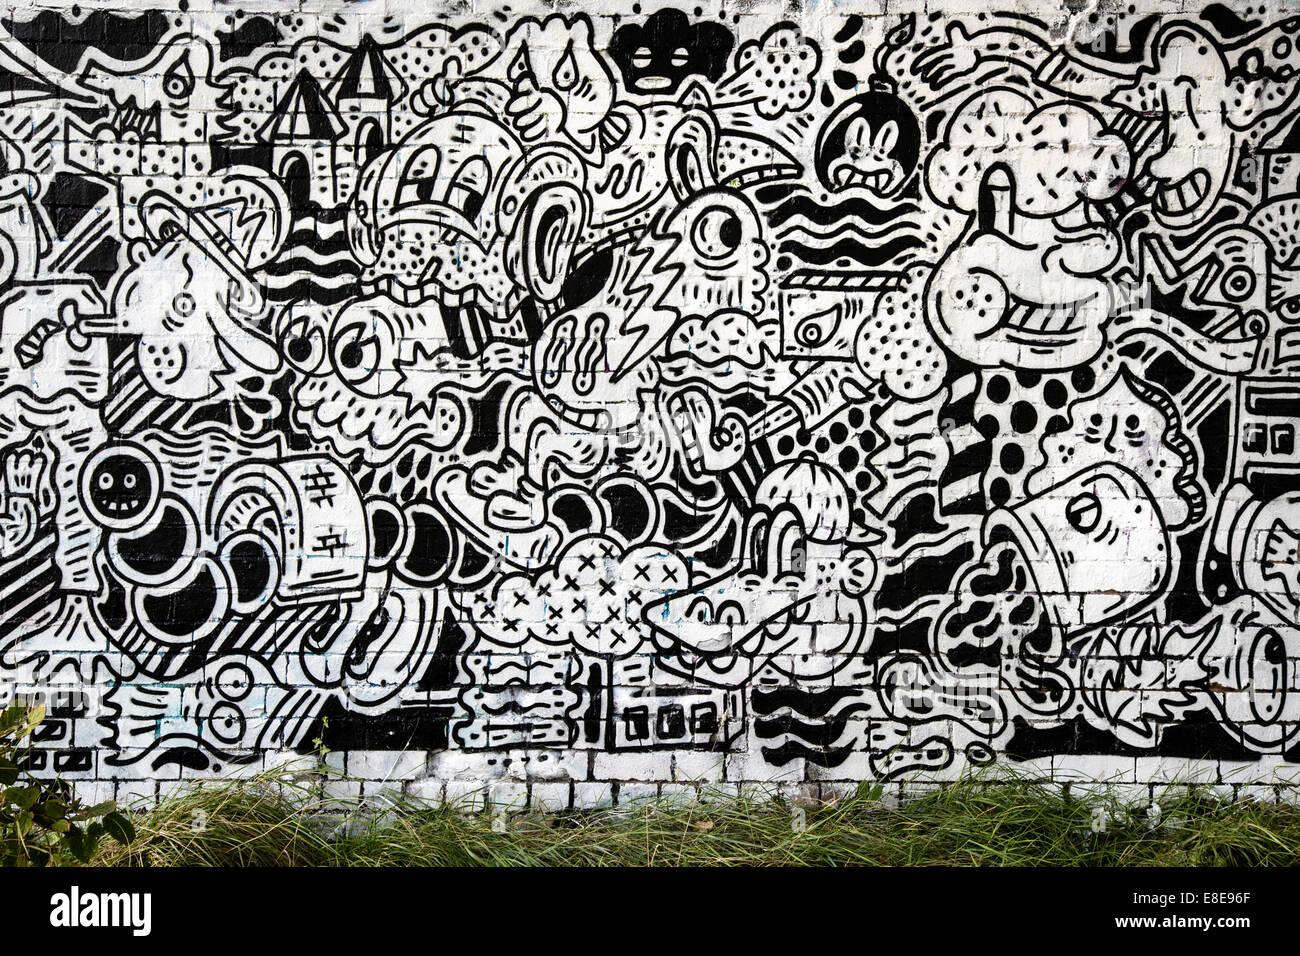 Giant black and white comic book graffiti mural under a for Comic book mural